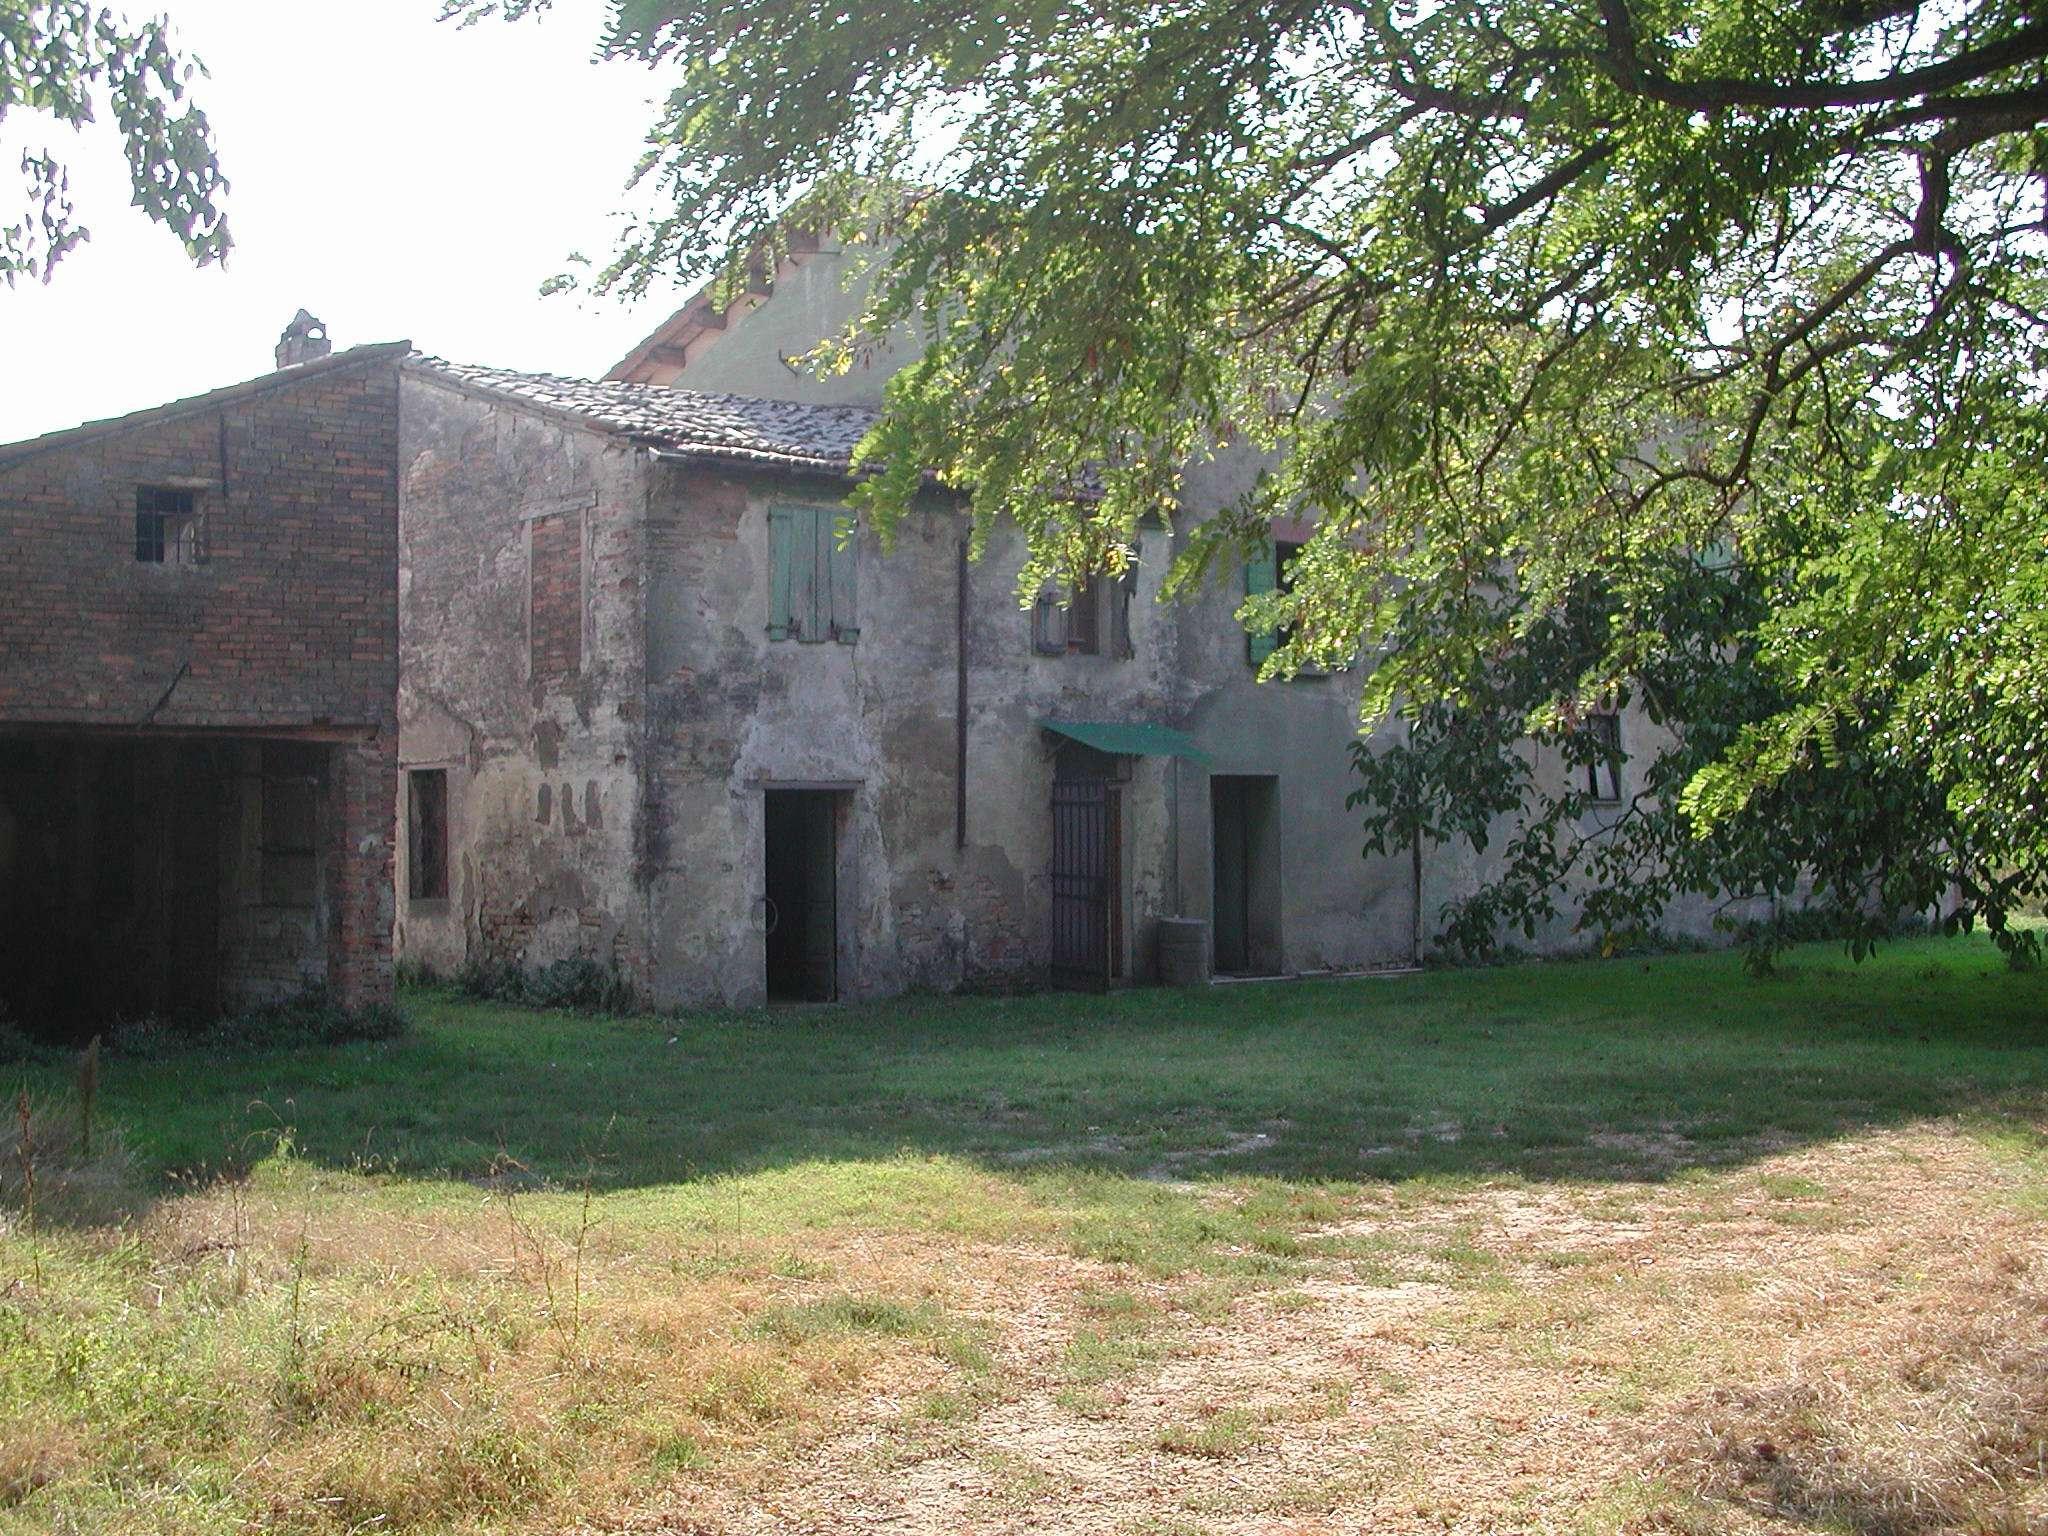 Rustico in Vendita a Ravenna Periferia Ovest: 500 mq